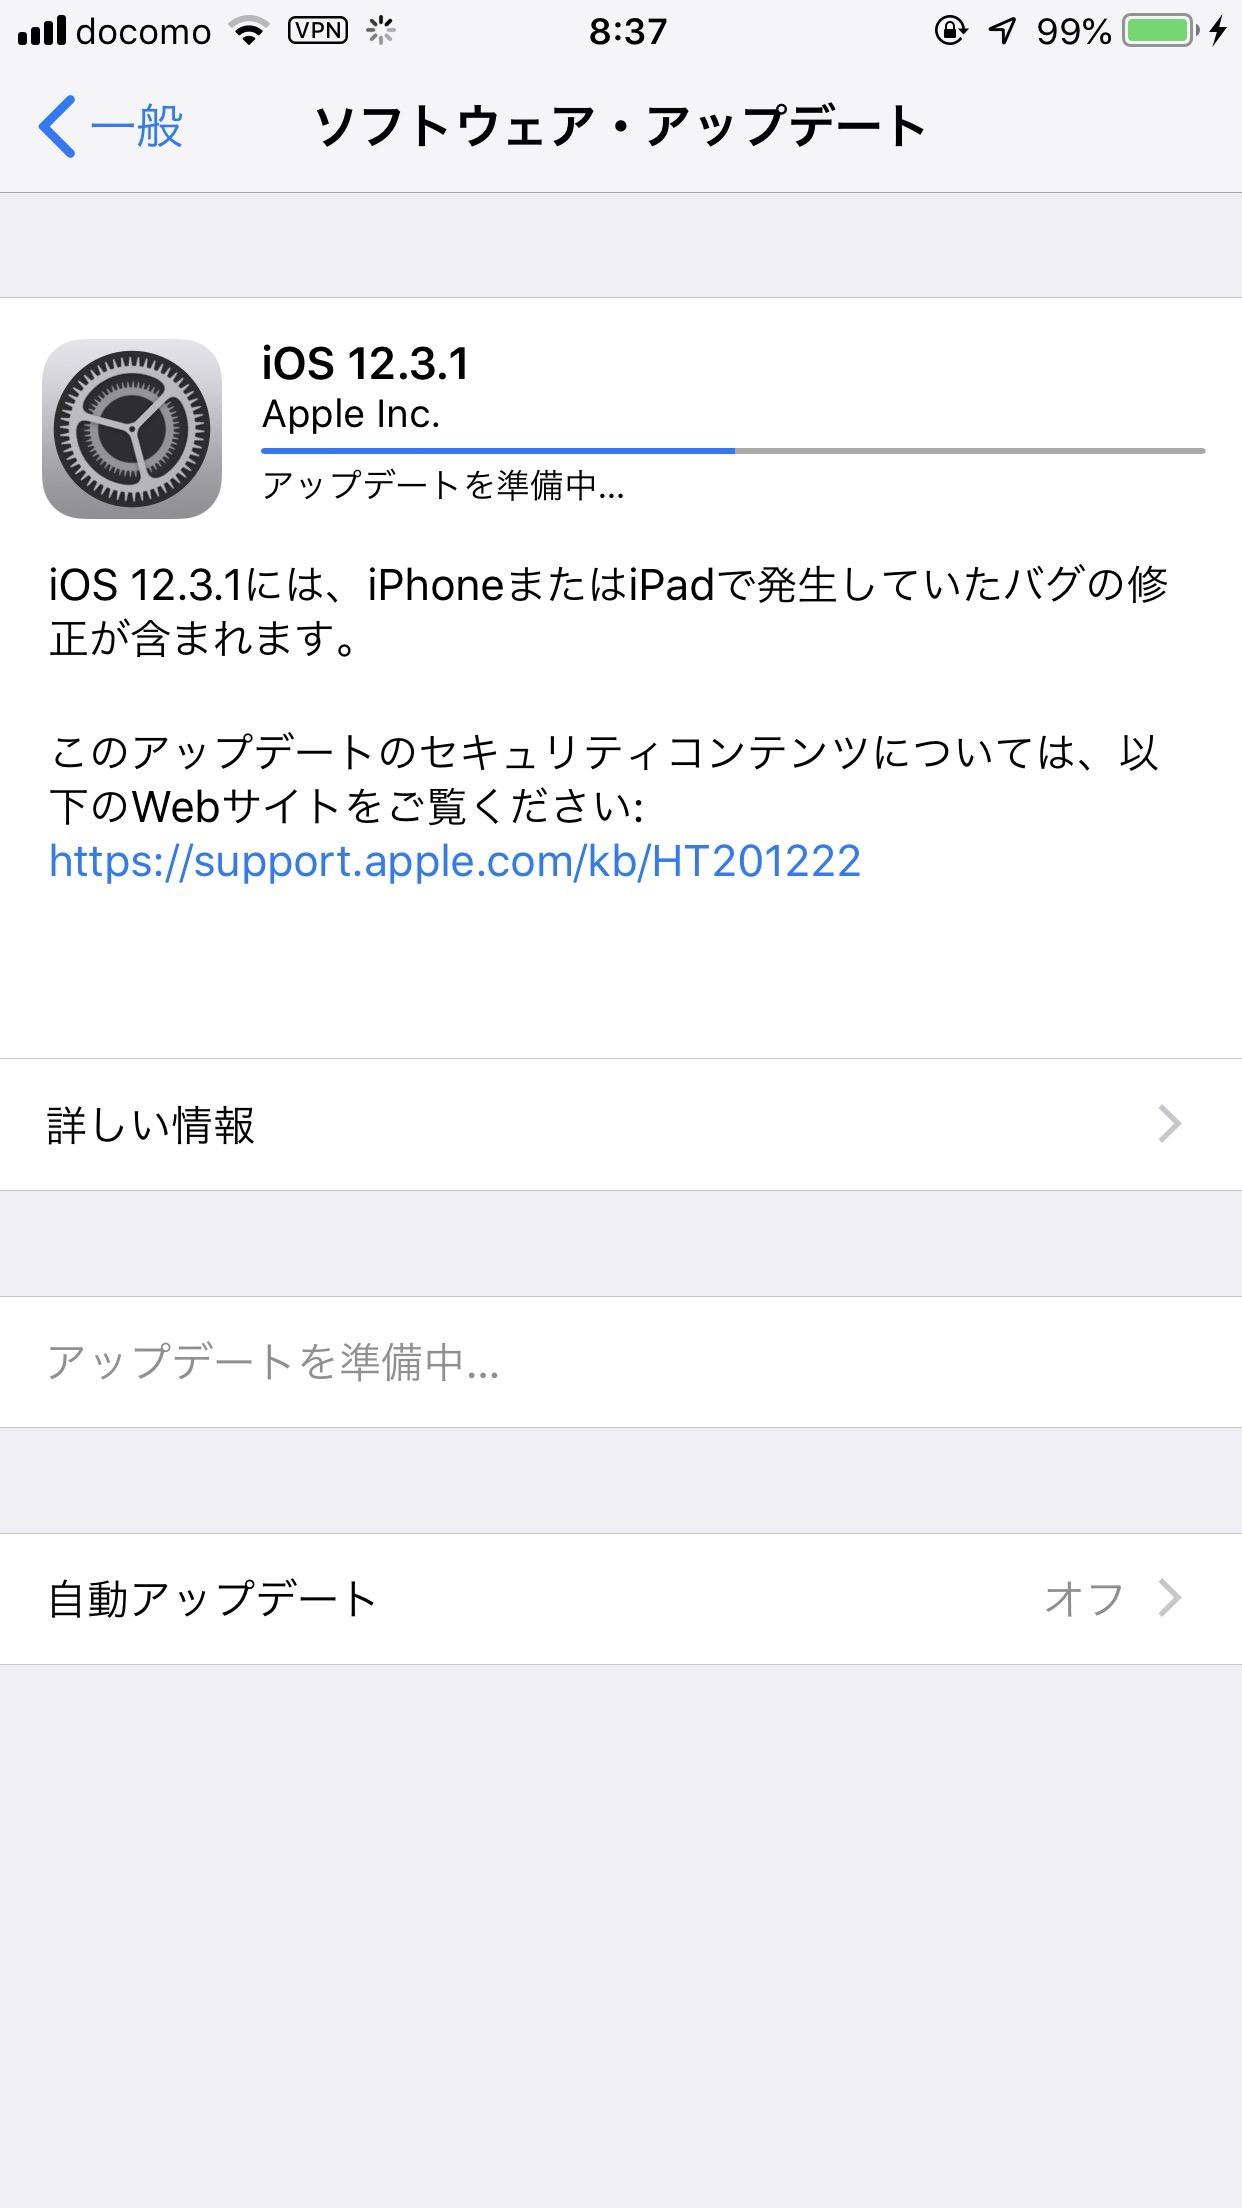 【iOS 12】「iOS 12.3.1 ソフトウェアアップデート」リリース